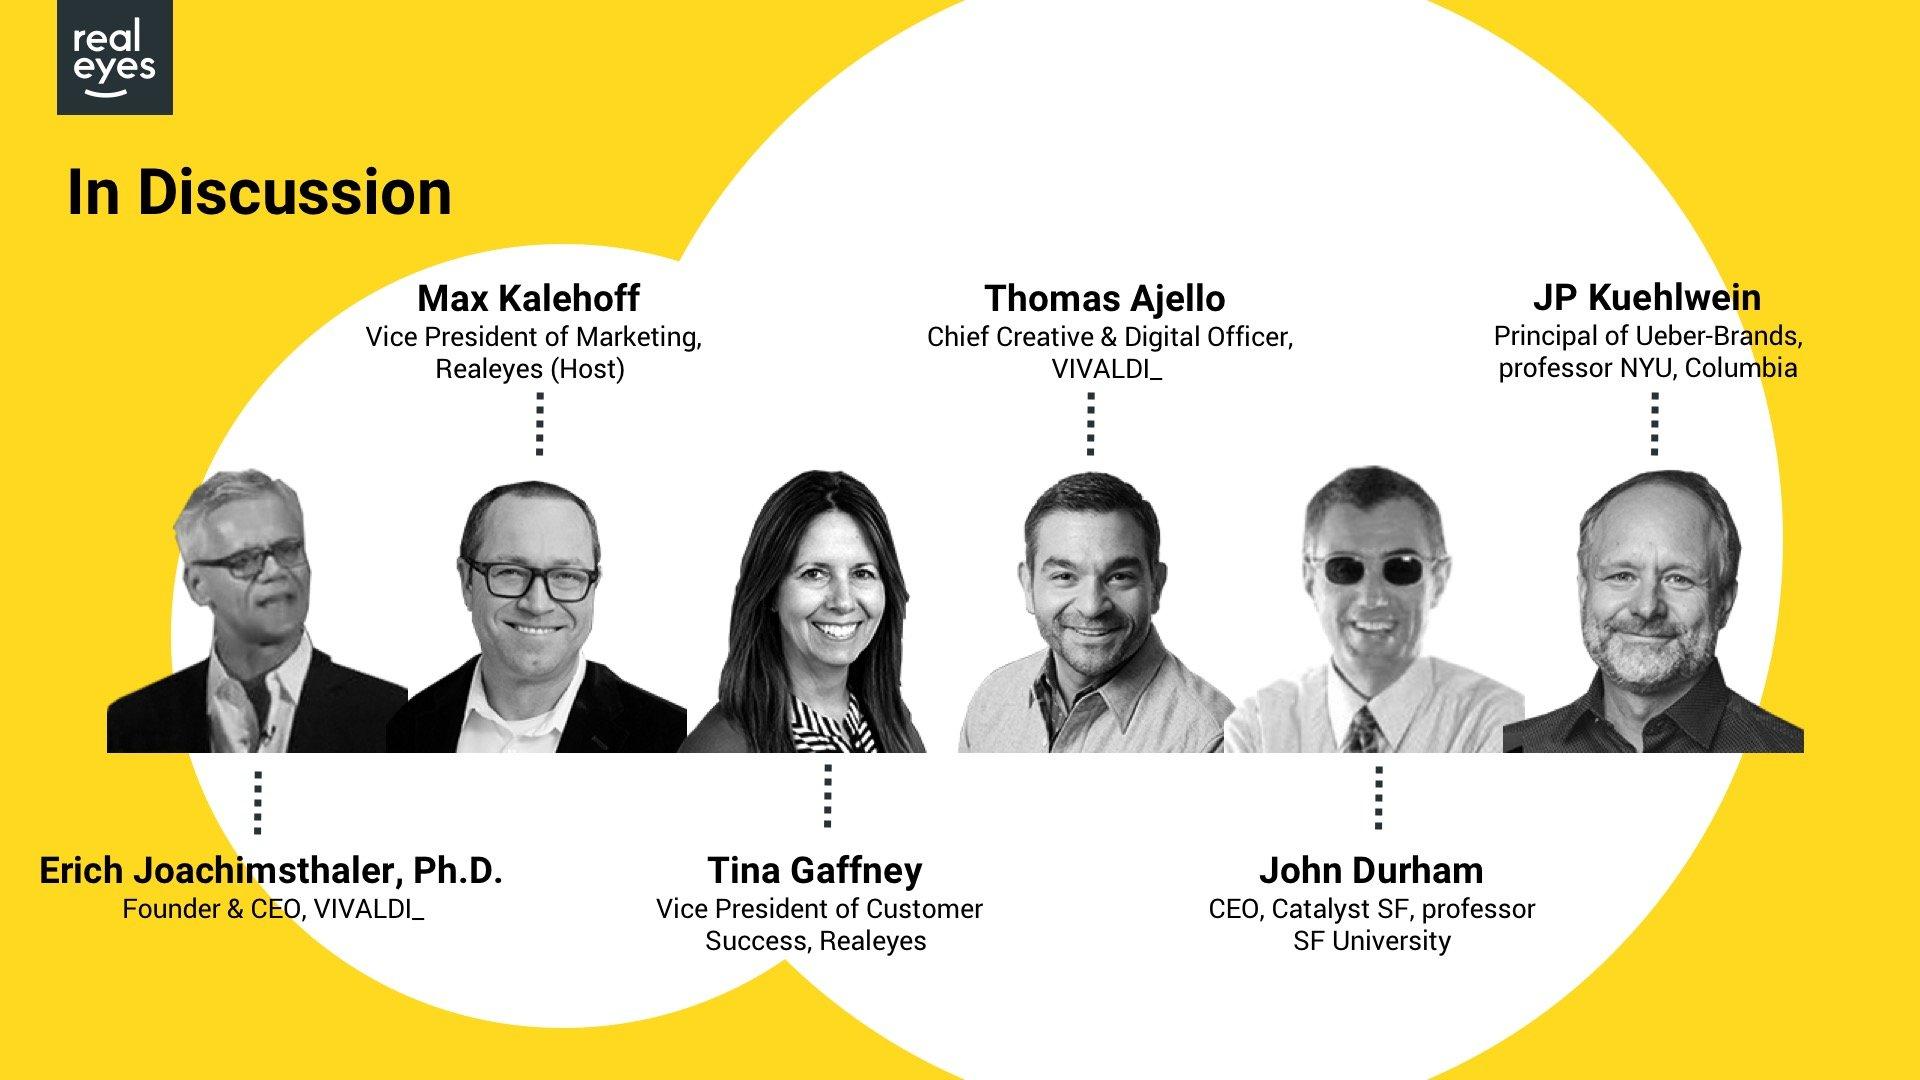 2020_04_10 - Brand Advertising Leadership COVID-19_2